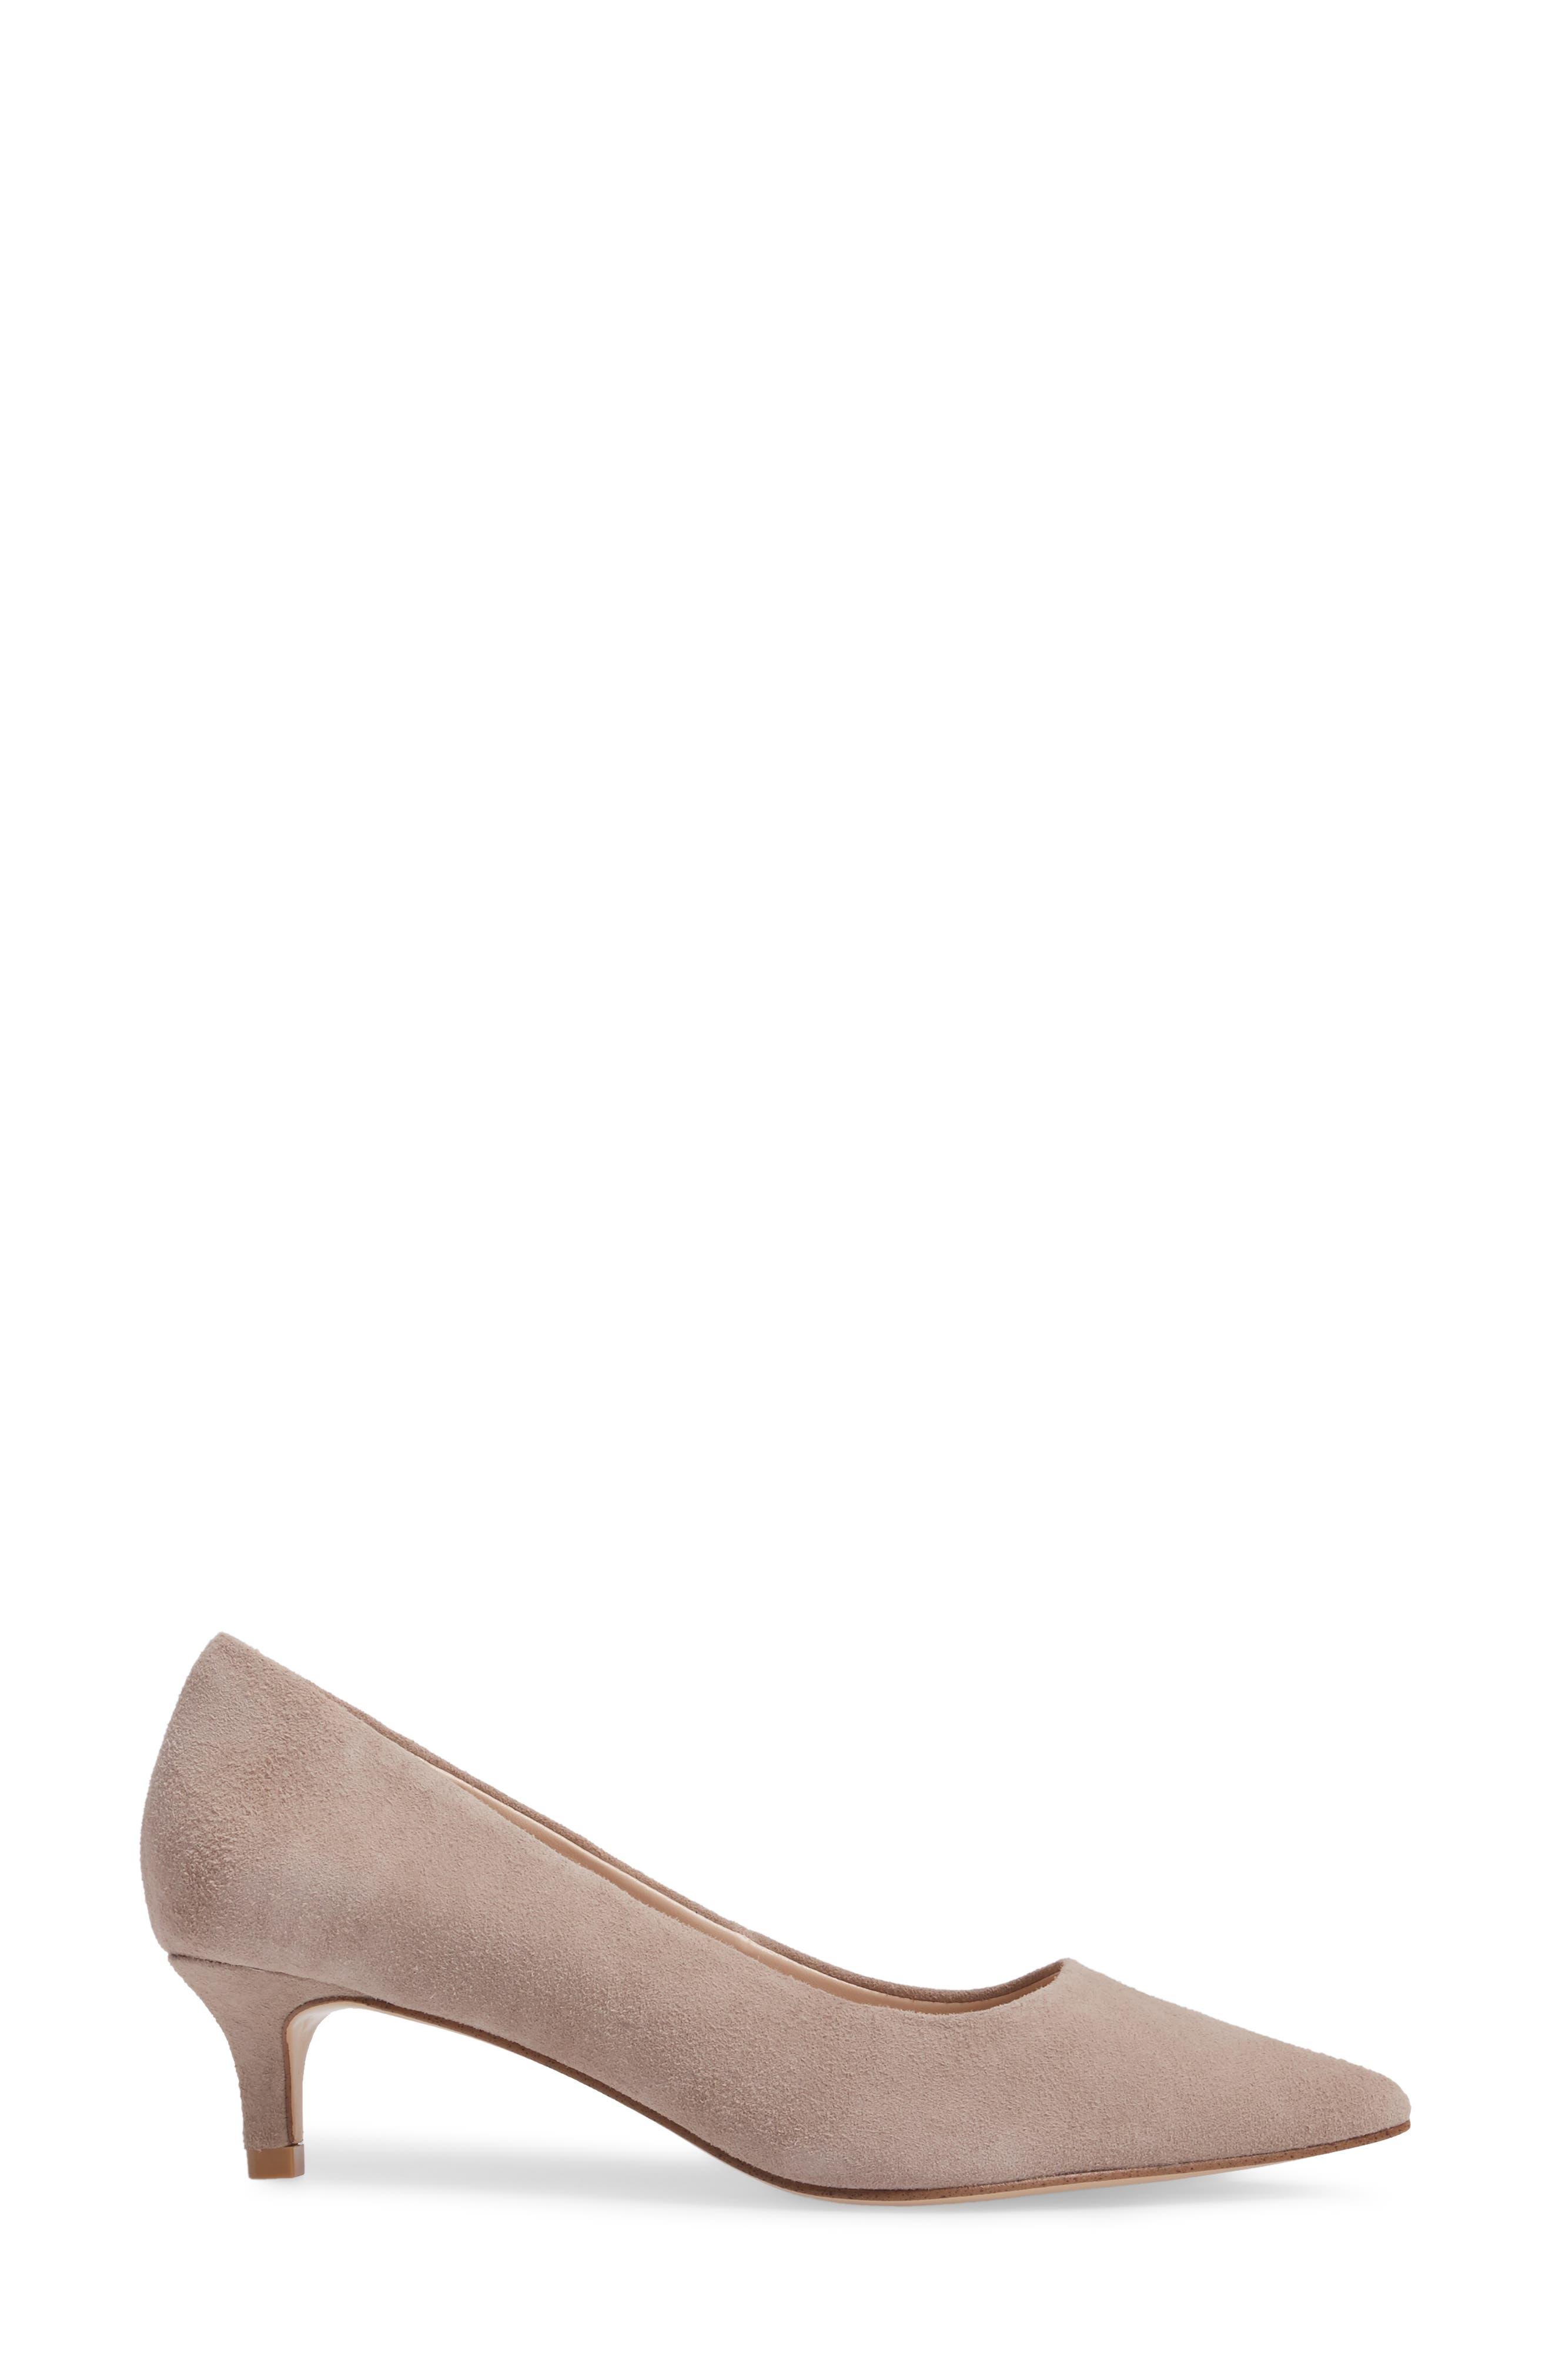 Dena Pointy Toe Pump,                             Alternate thumbnail 3, color,                             Mushroom Leather